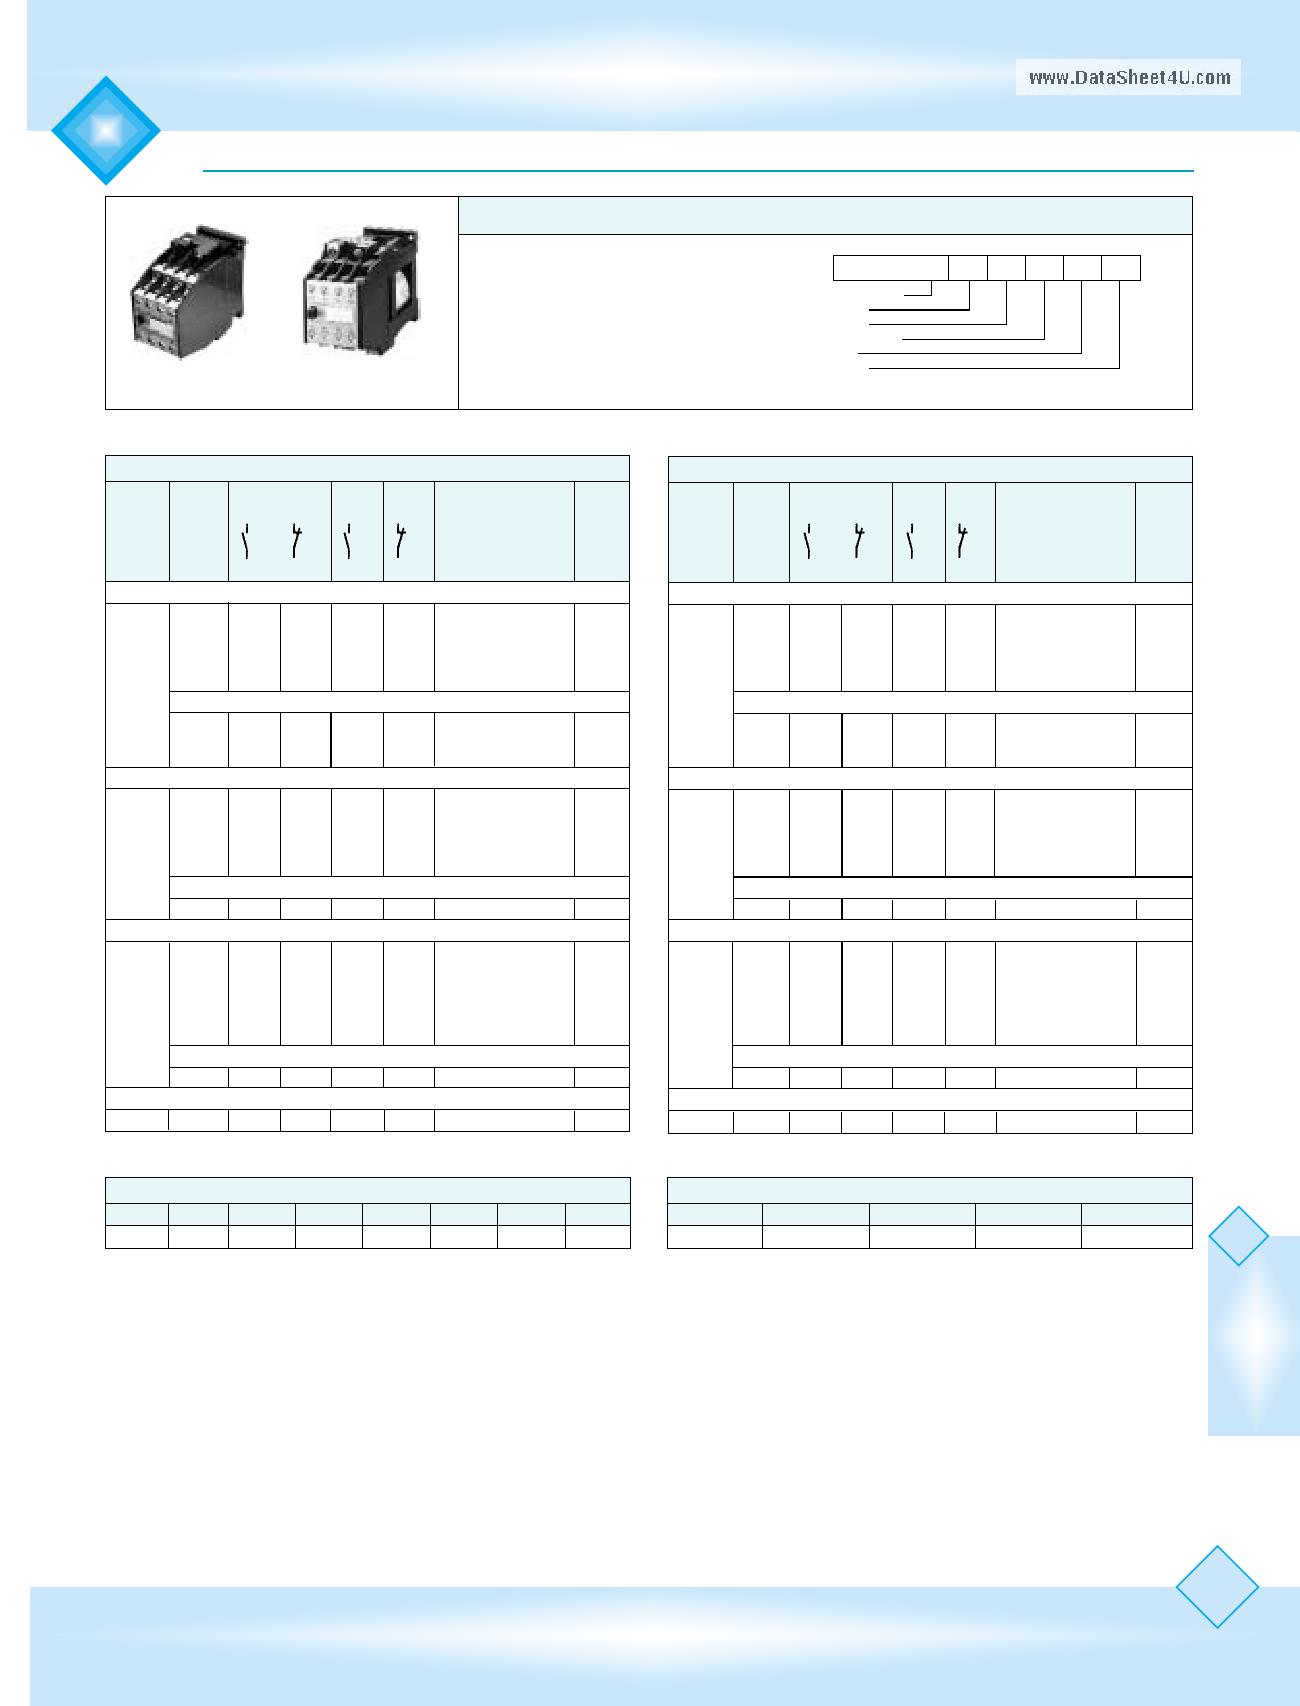 3TH4355-0A Datasheet, 3TH4355-0A PDF,ピン配置, 機能